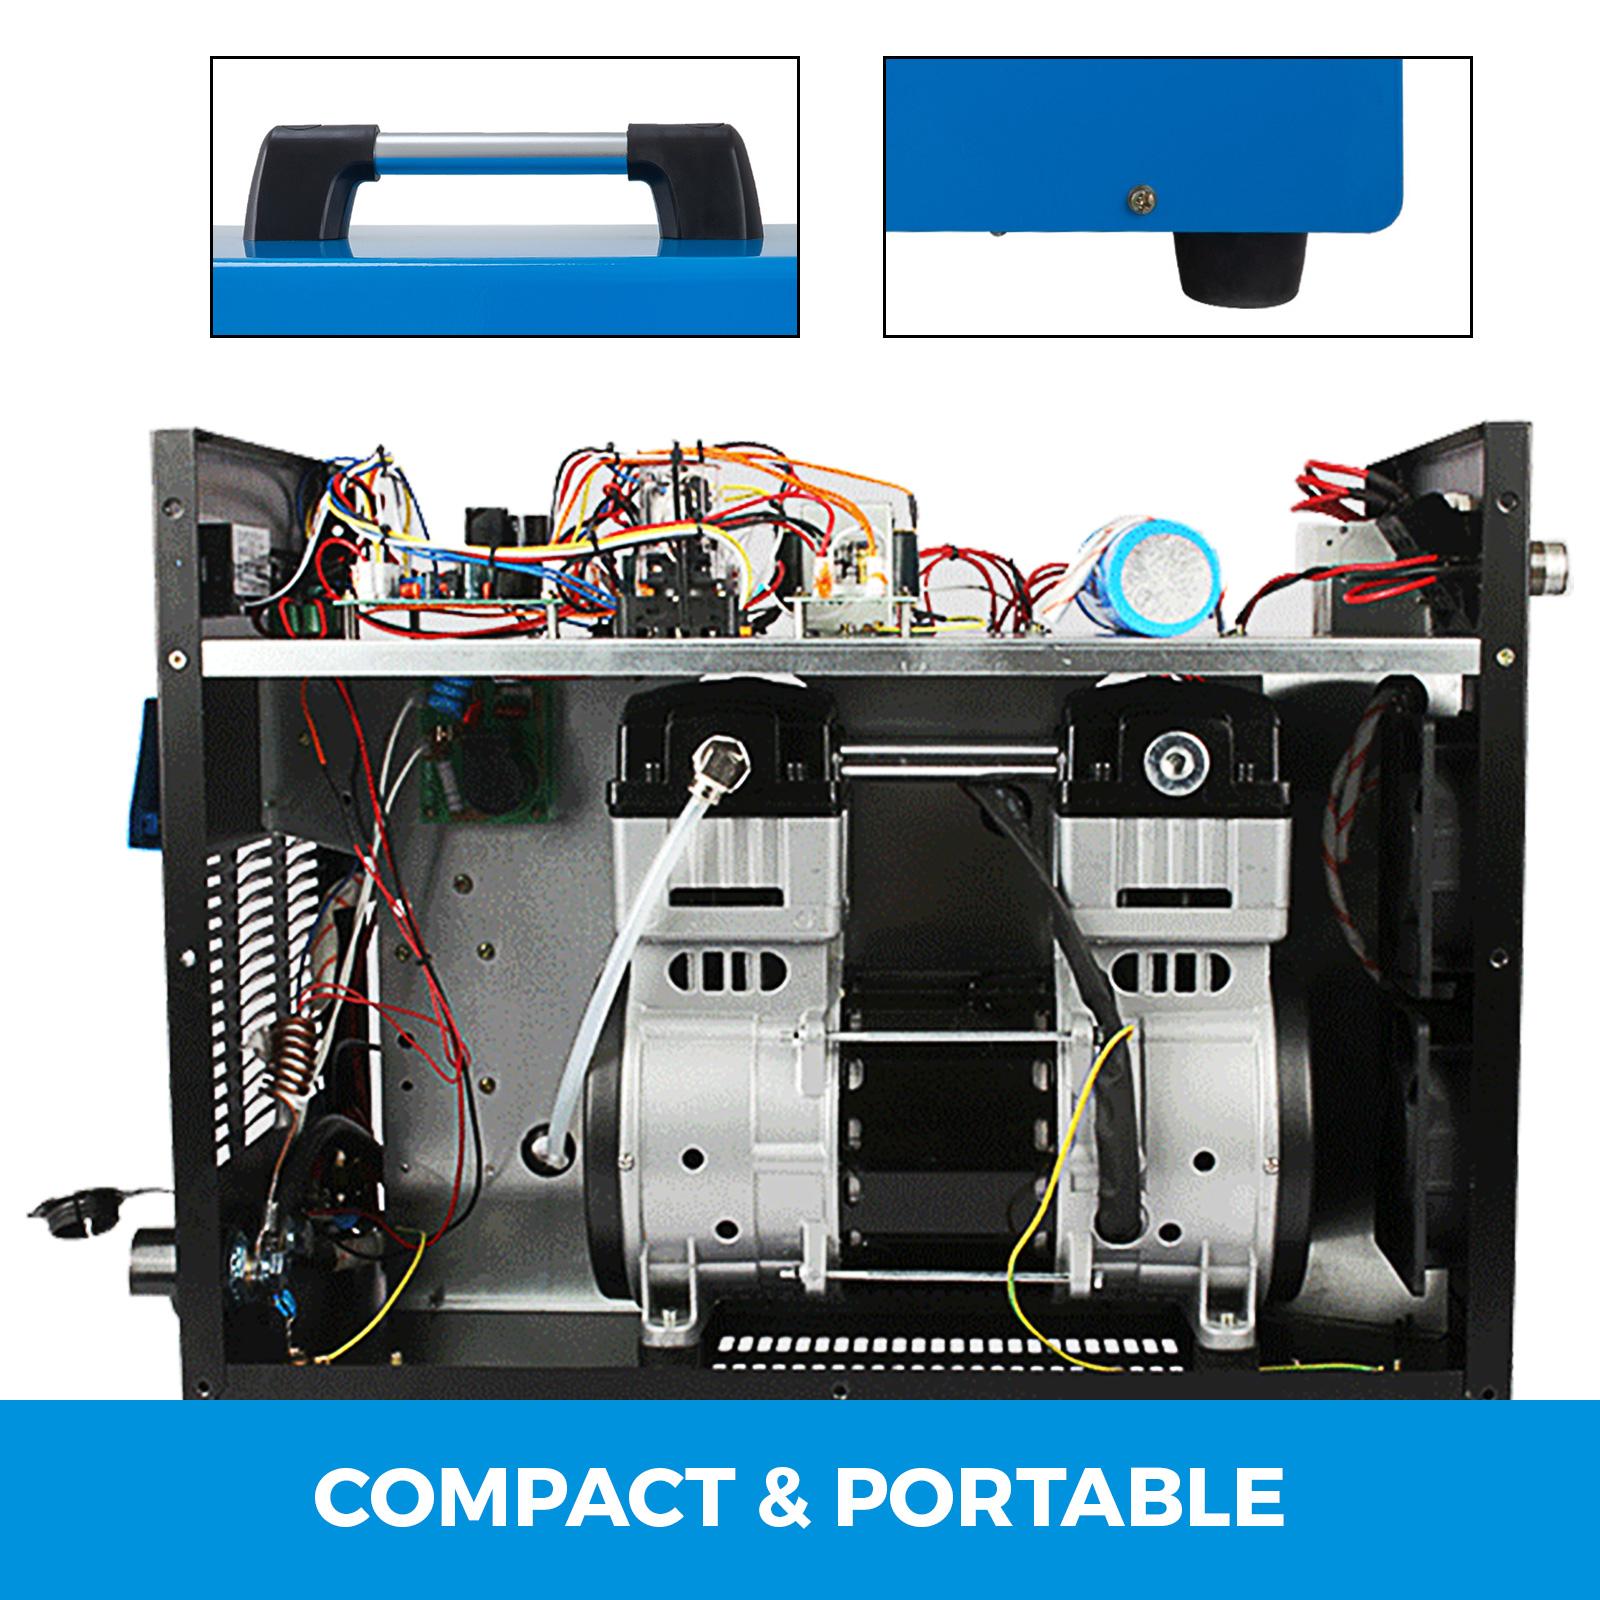 40-85A-Plasma-Cutter-Built-In-Air-Compressor-Inverter-Cutting-Machine-Cut-35mm thumbnail 30